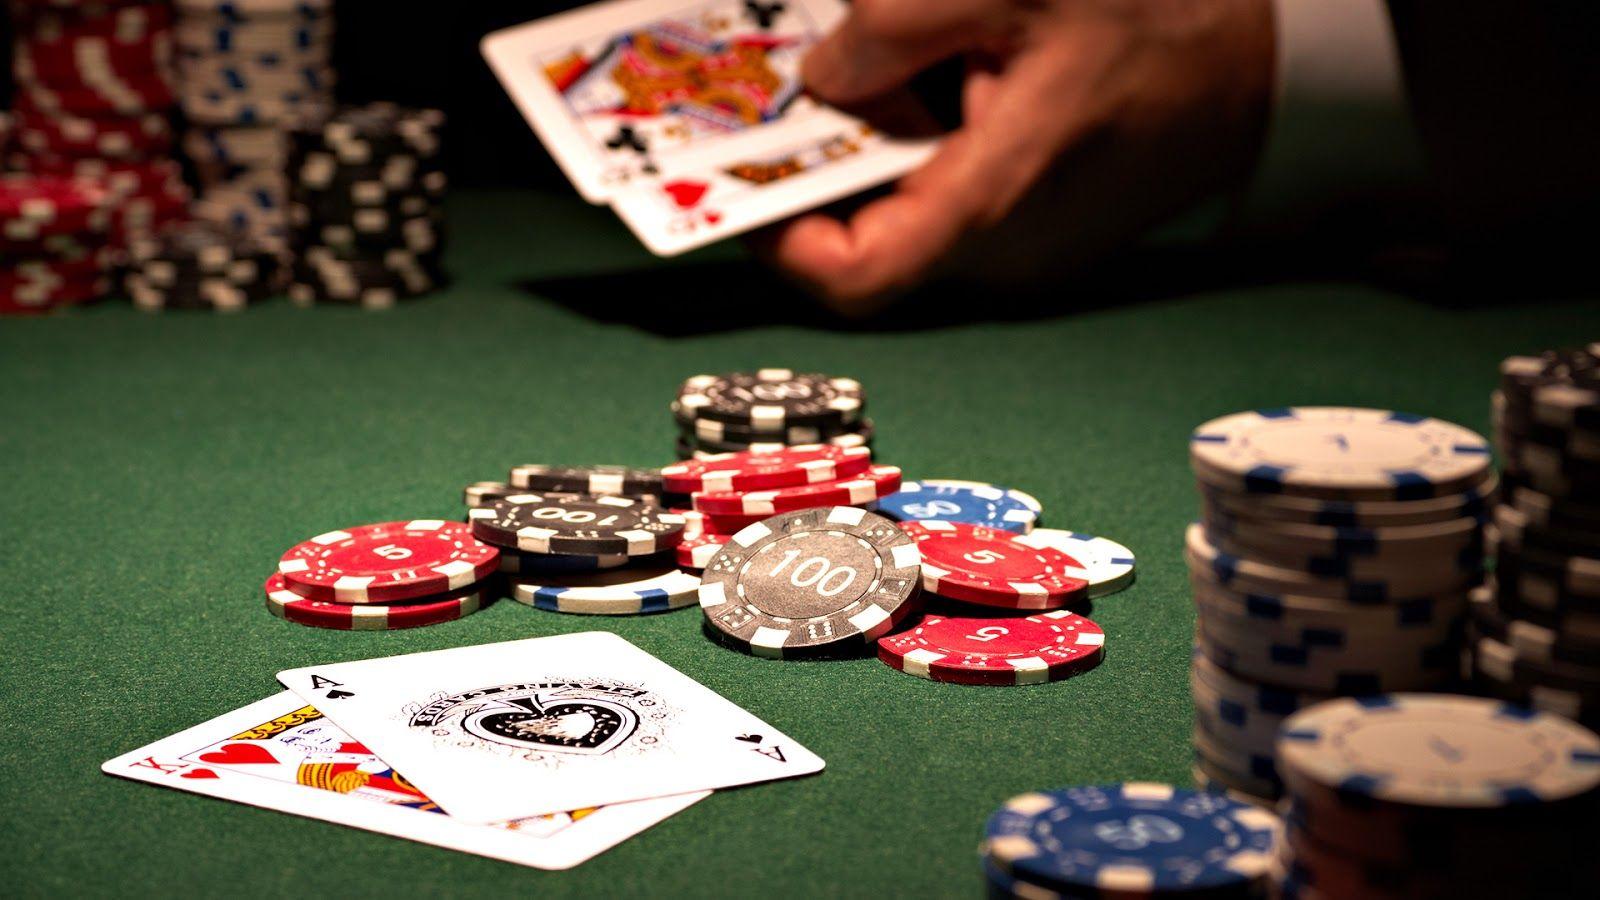 Riversweeps Online Casino for Beginners